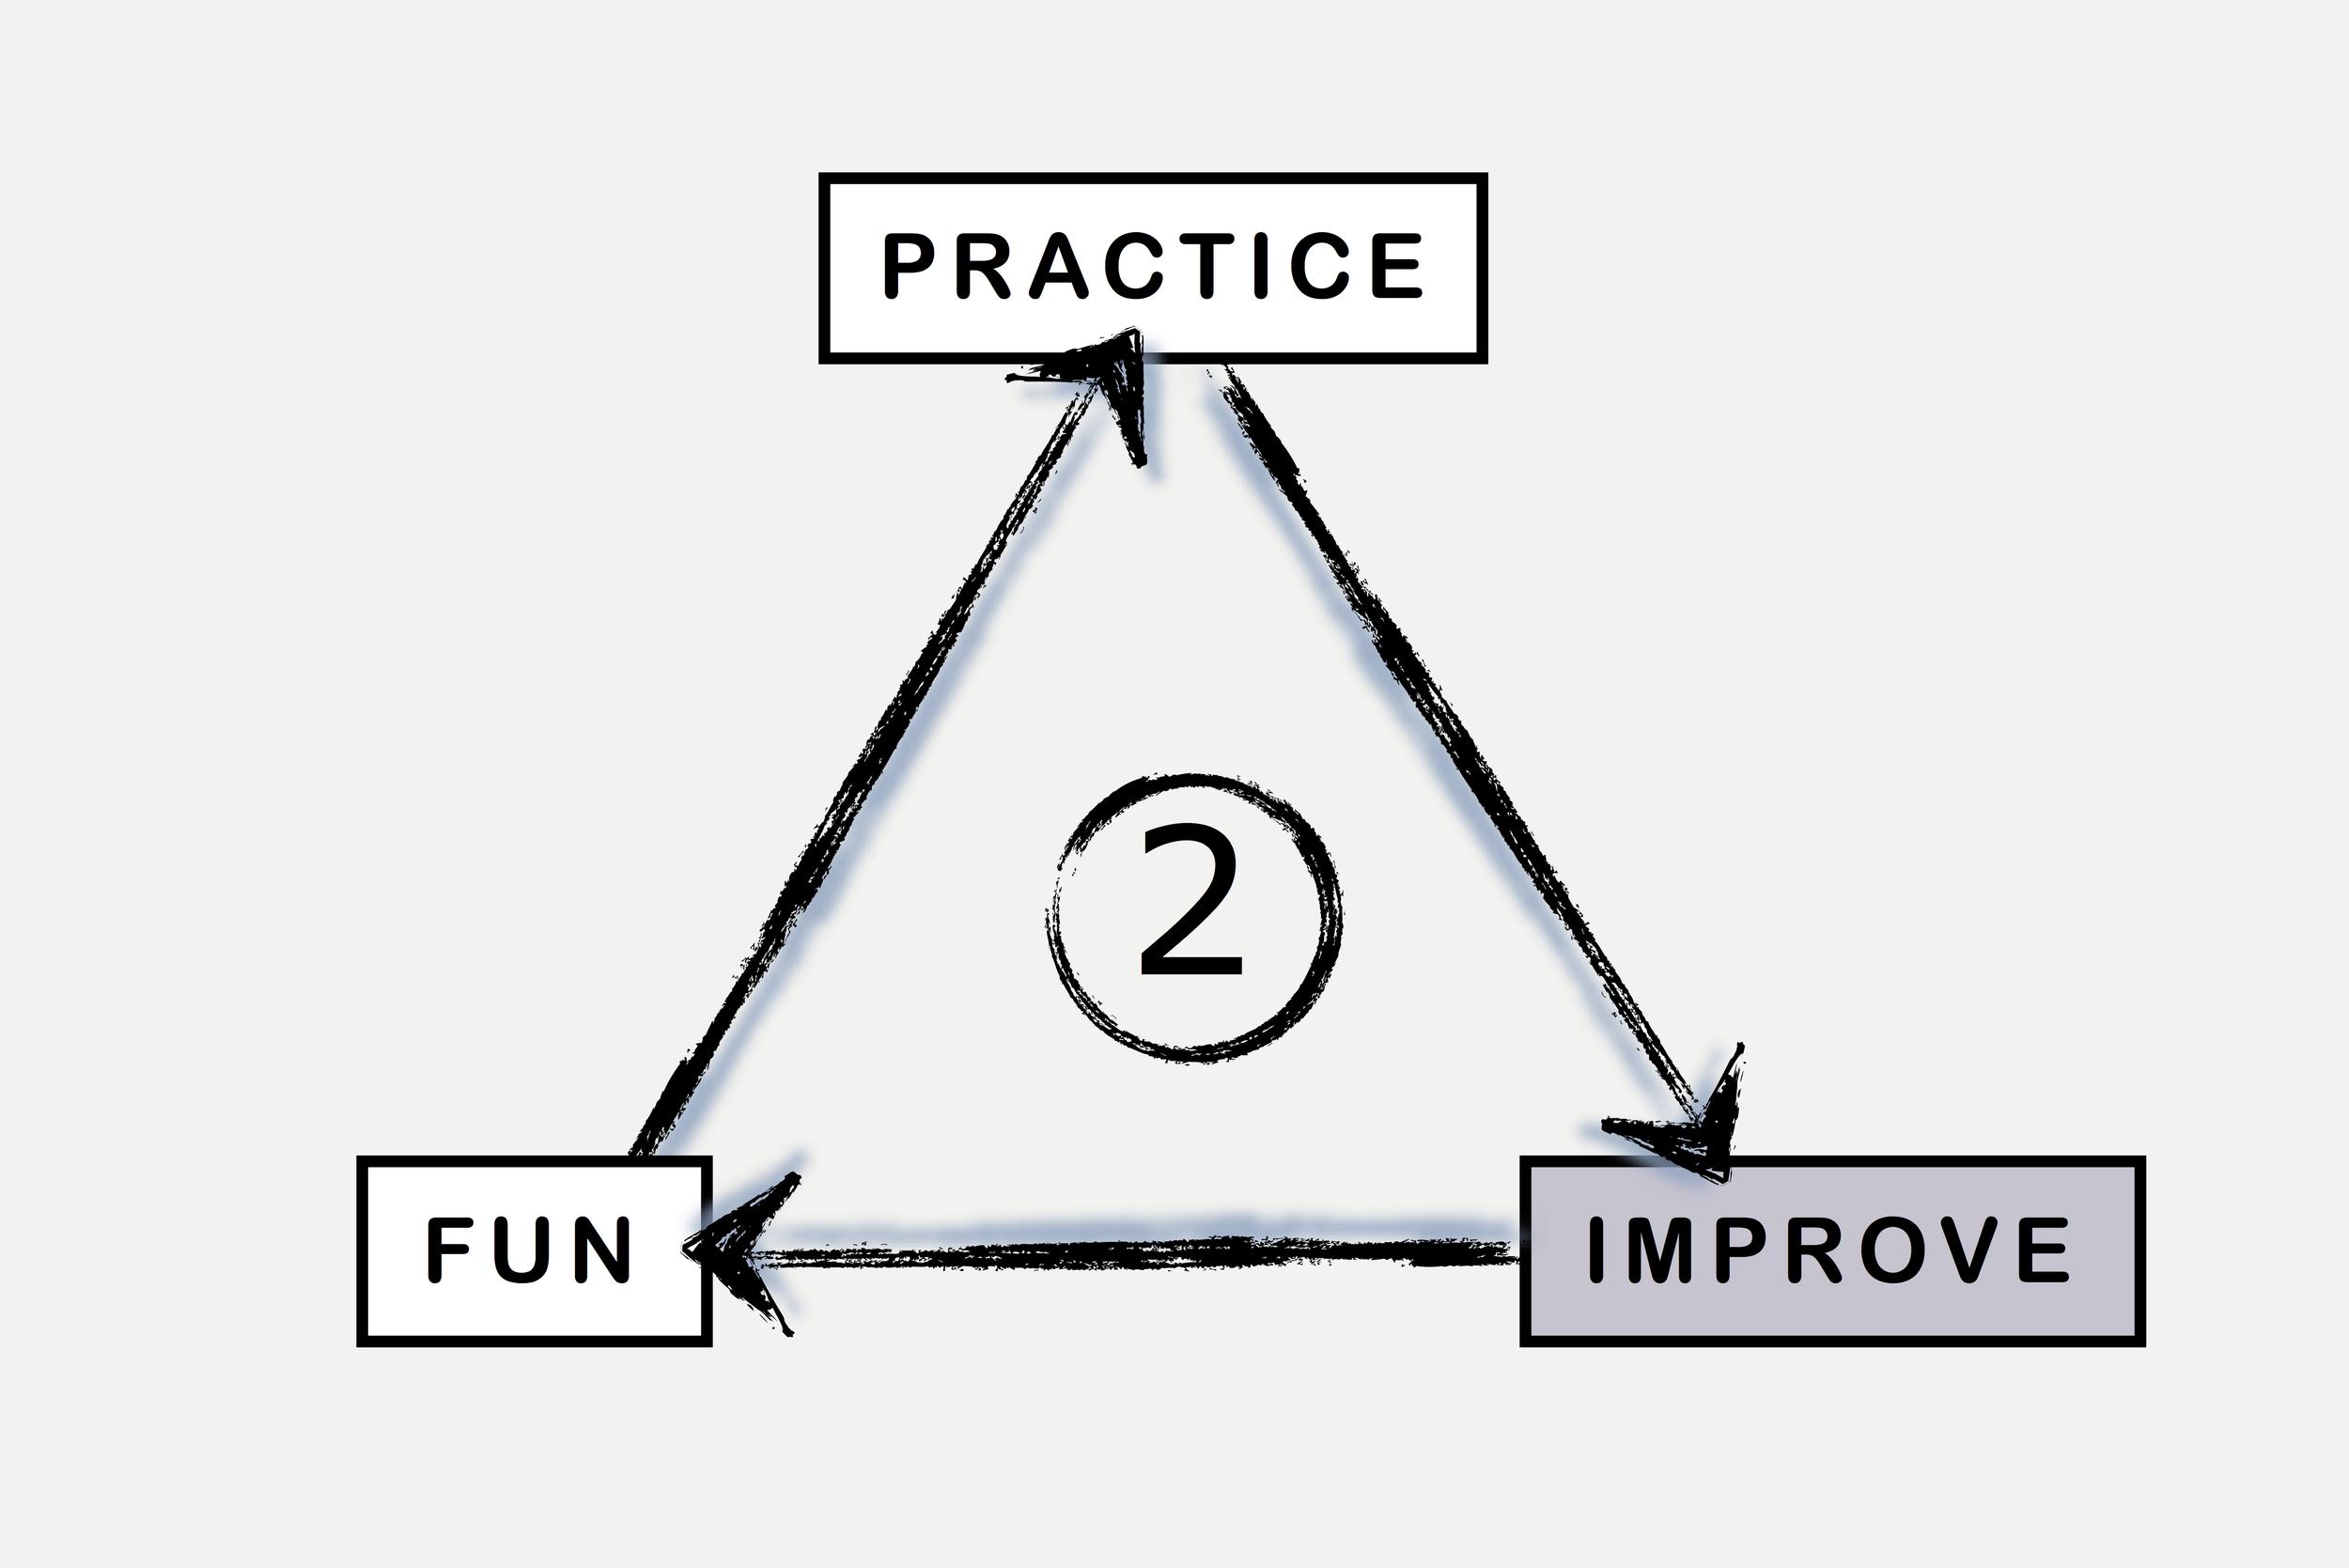 BML Practice Better Fun Triangle.2.jpg